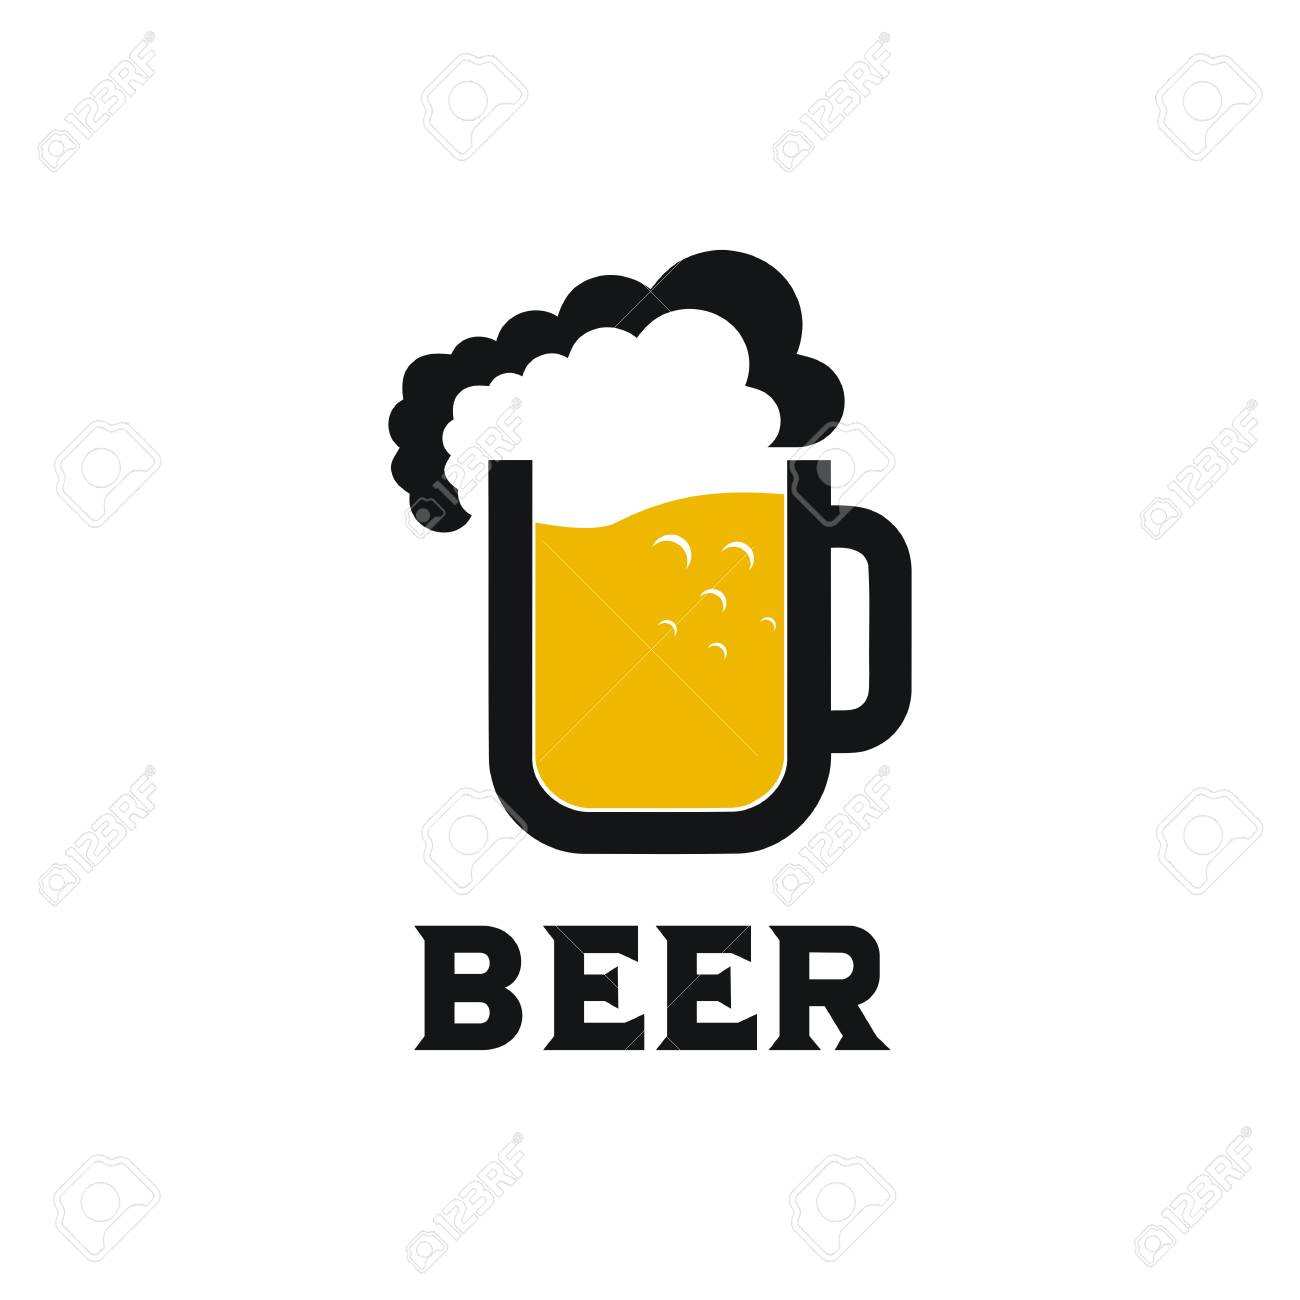 Beer Mug Logo Vector Design Illustration Royalty Free Cliparts Vectors And Stock Illustration Image 121094408